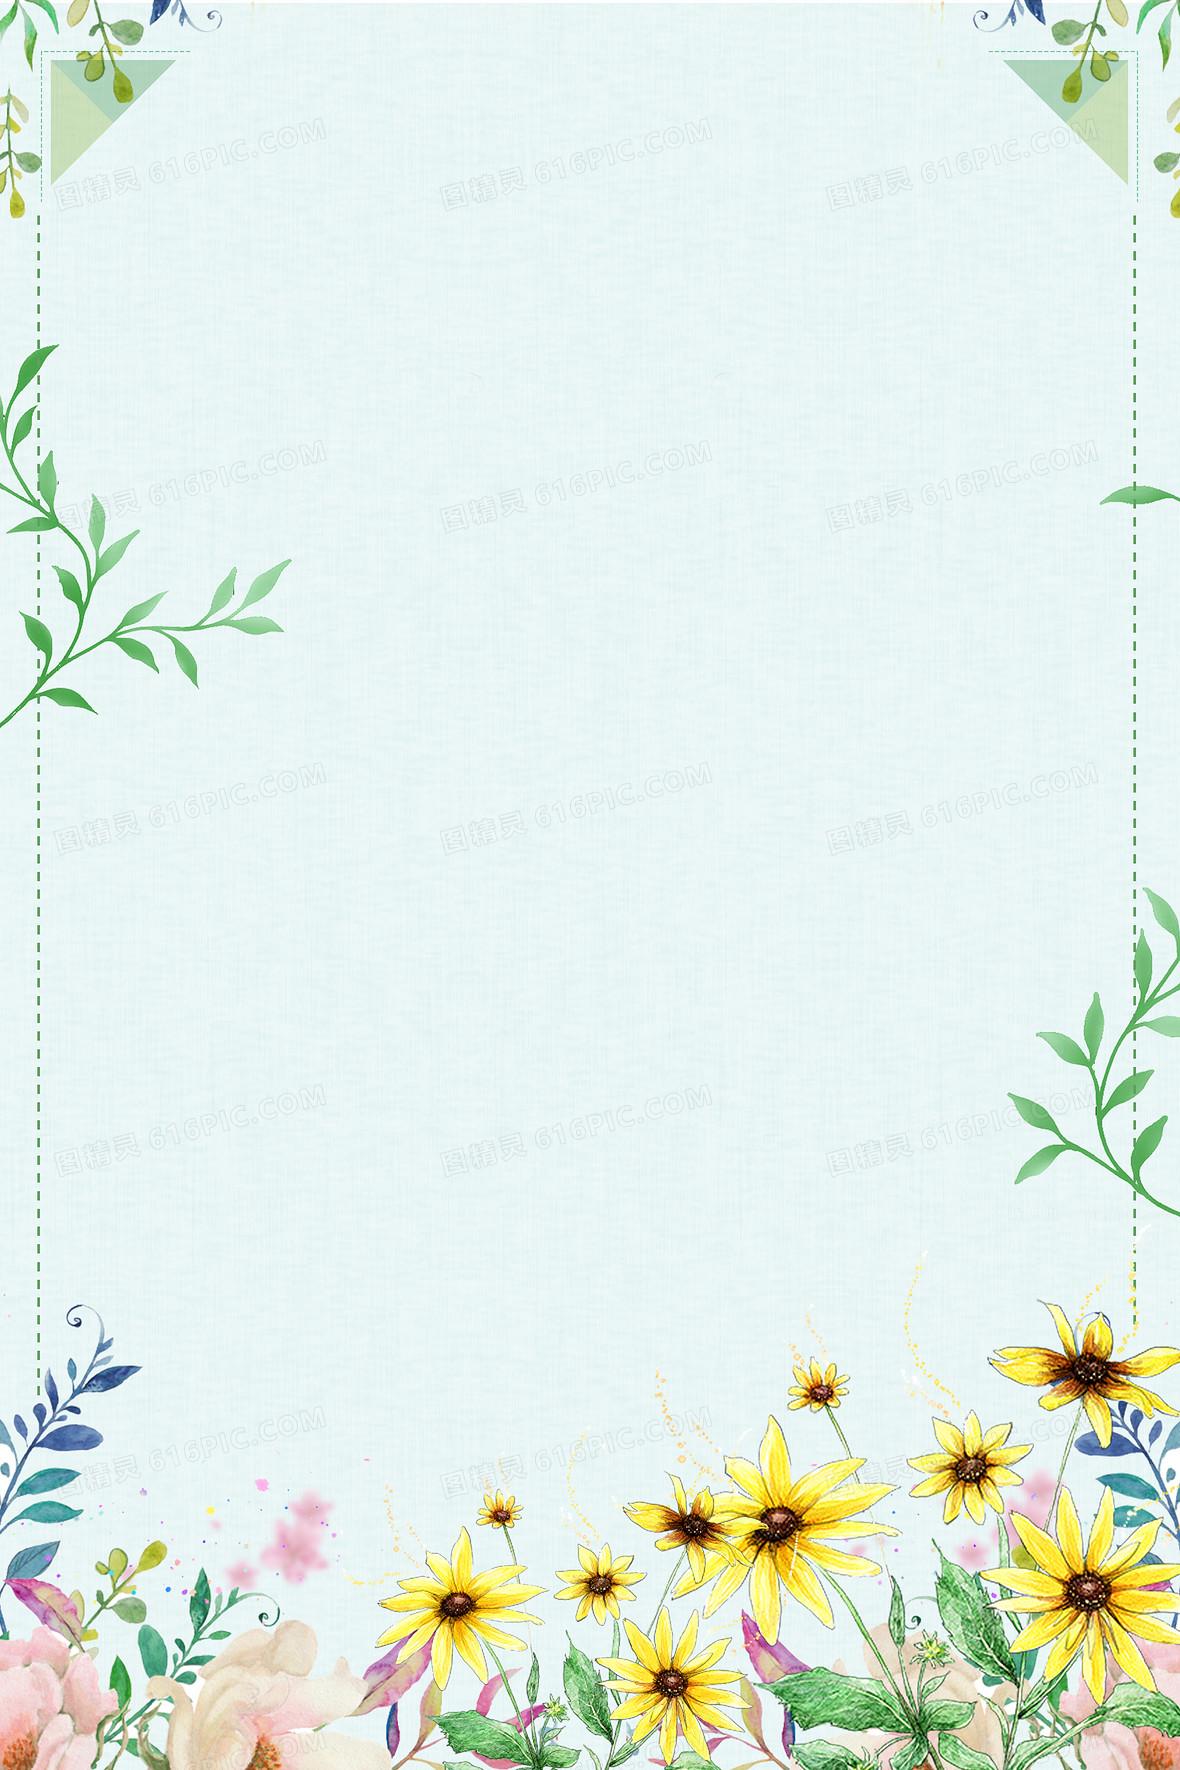 ppt 背景 背景图片 壁纸 边框 模板 设计 相框 1180_1770 竖版 竖屏